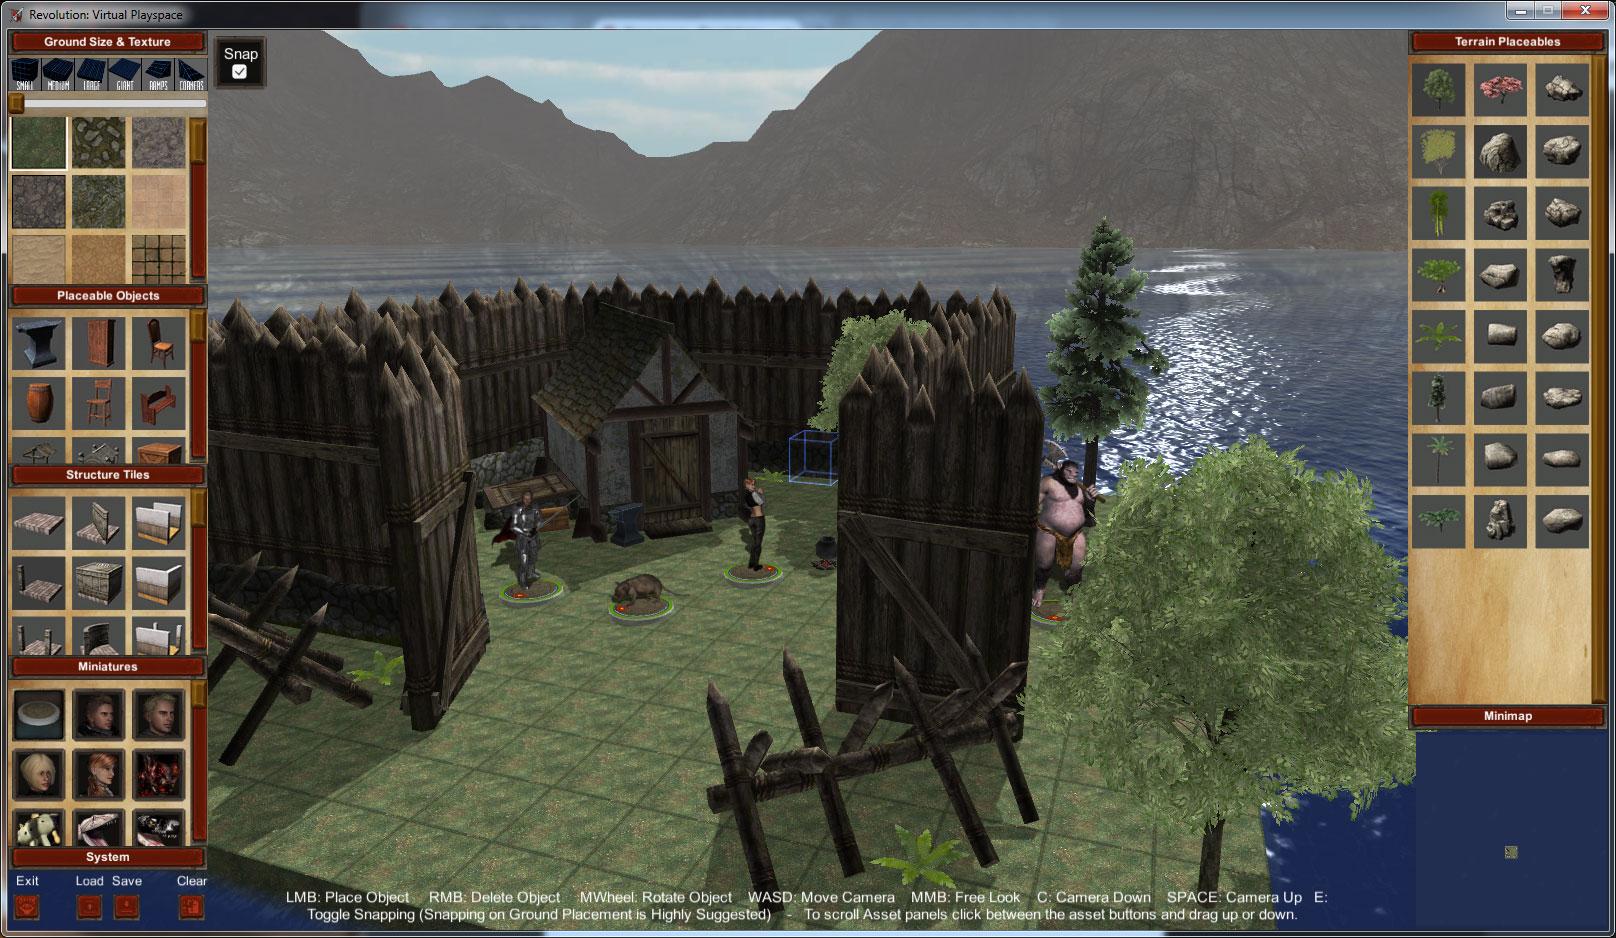 R:VPS image - Revolution : Virtual Playspace - Indie DB